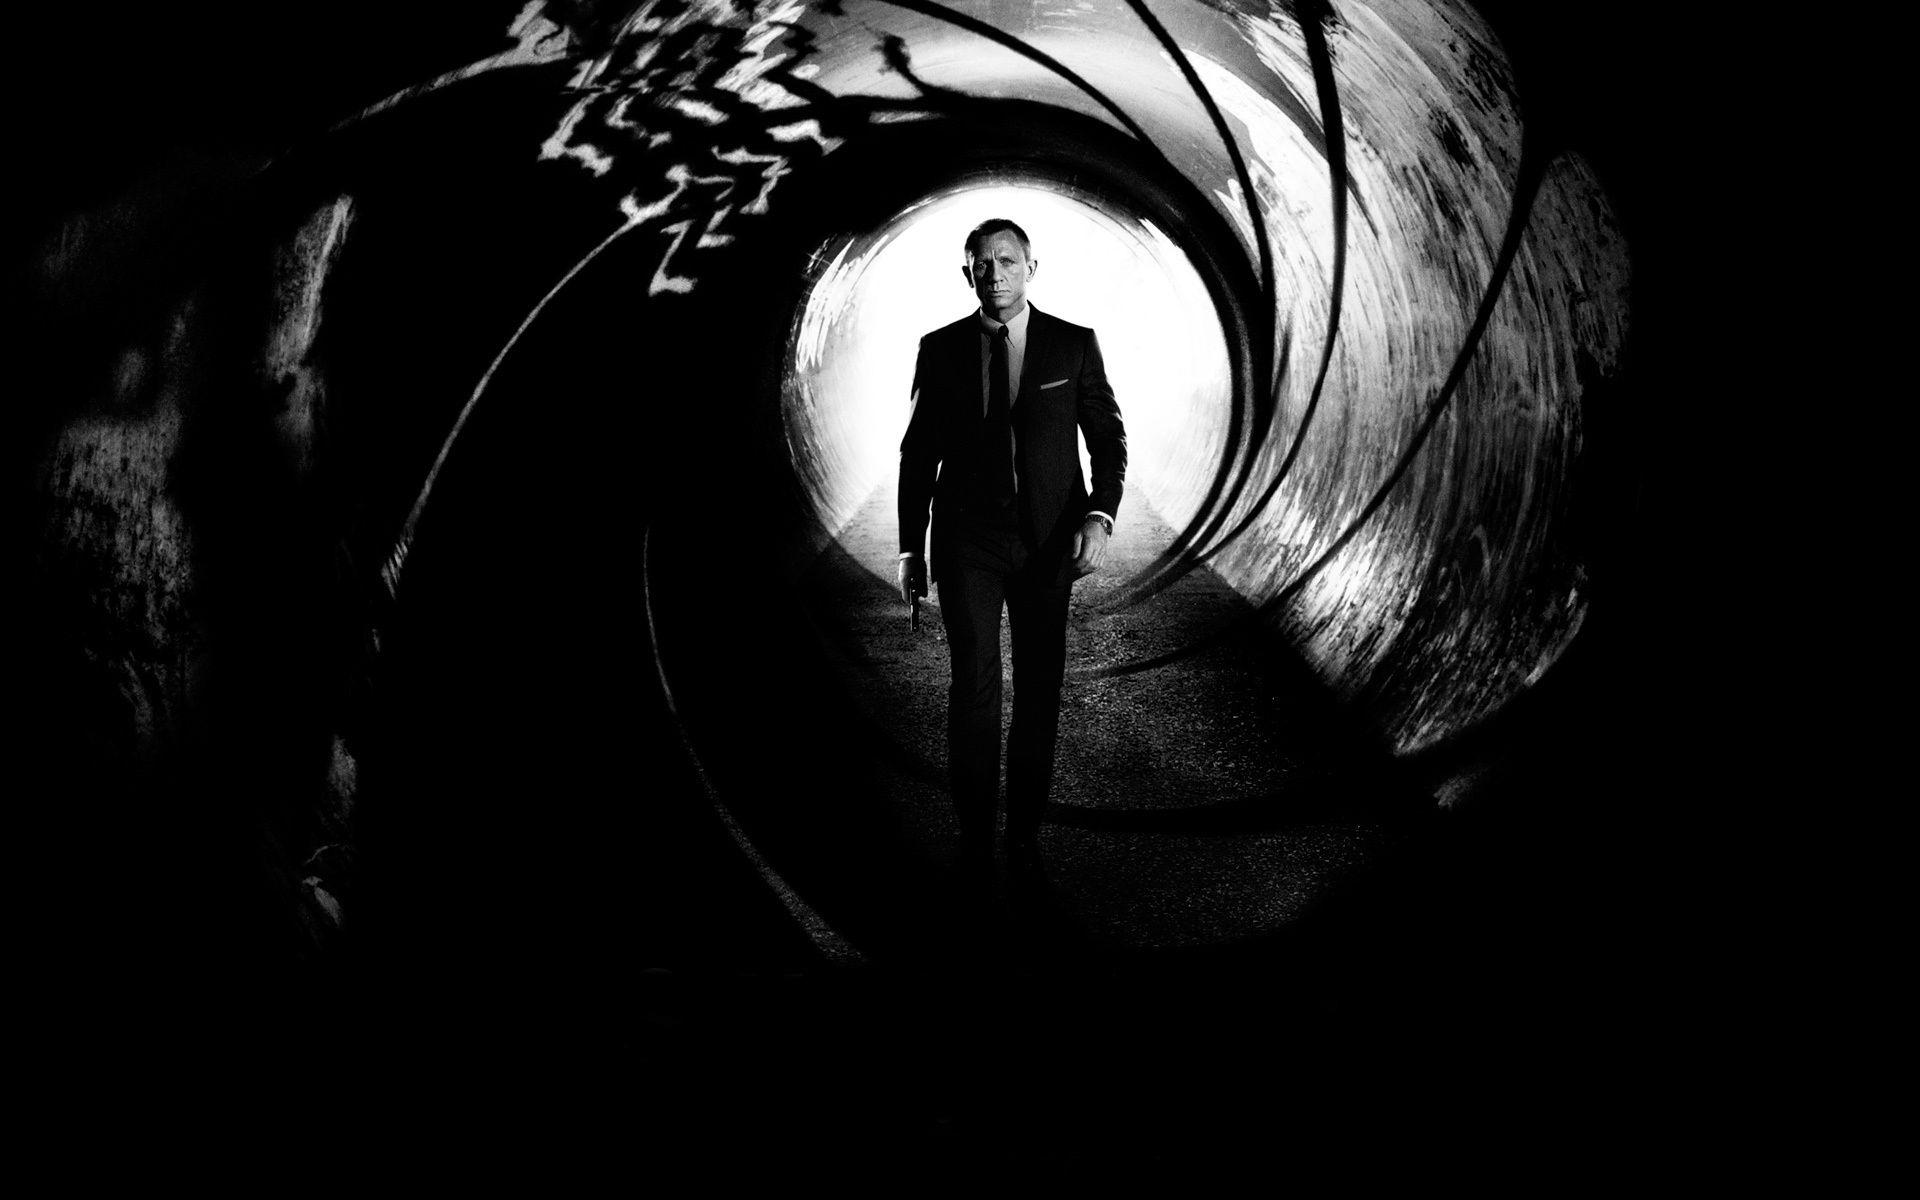 [47+] James Bond Desktop Wallpaper on WallpaperSafari